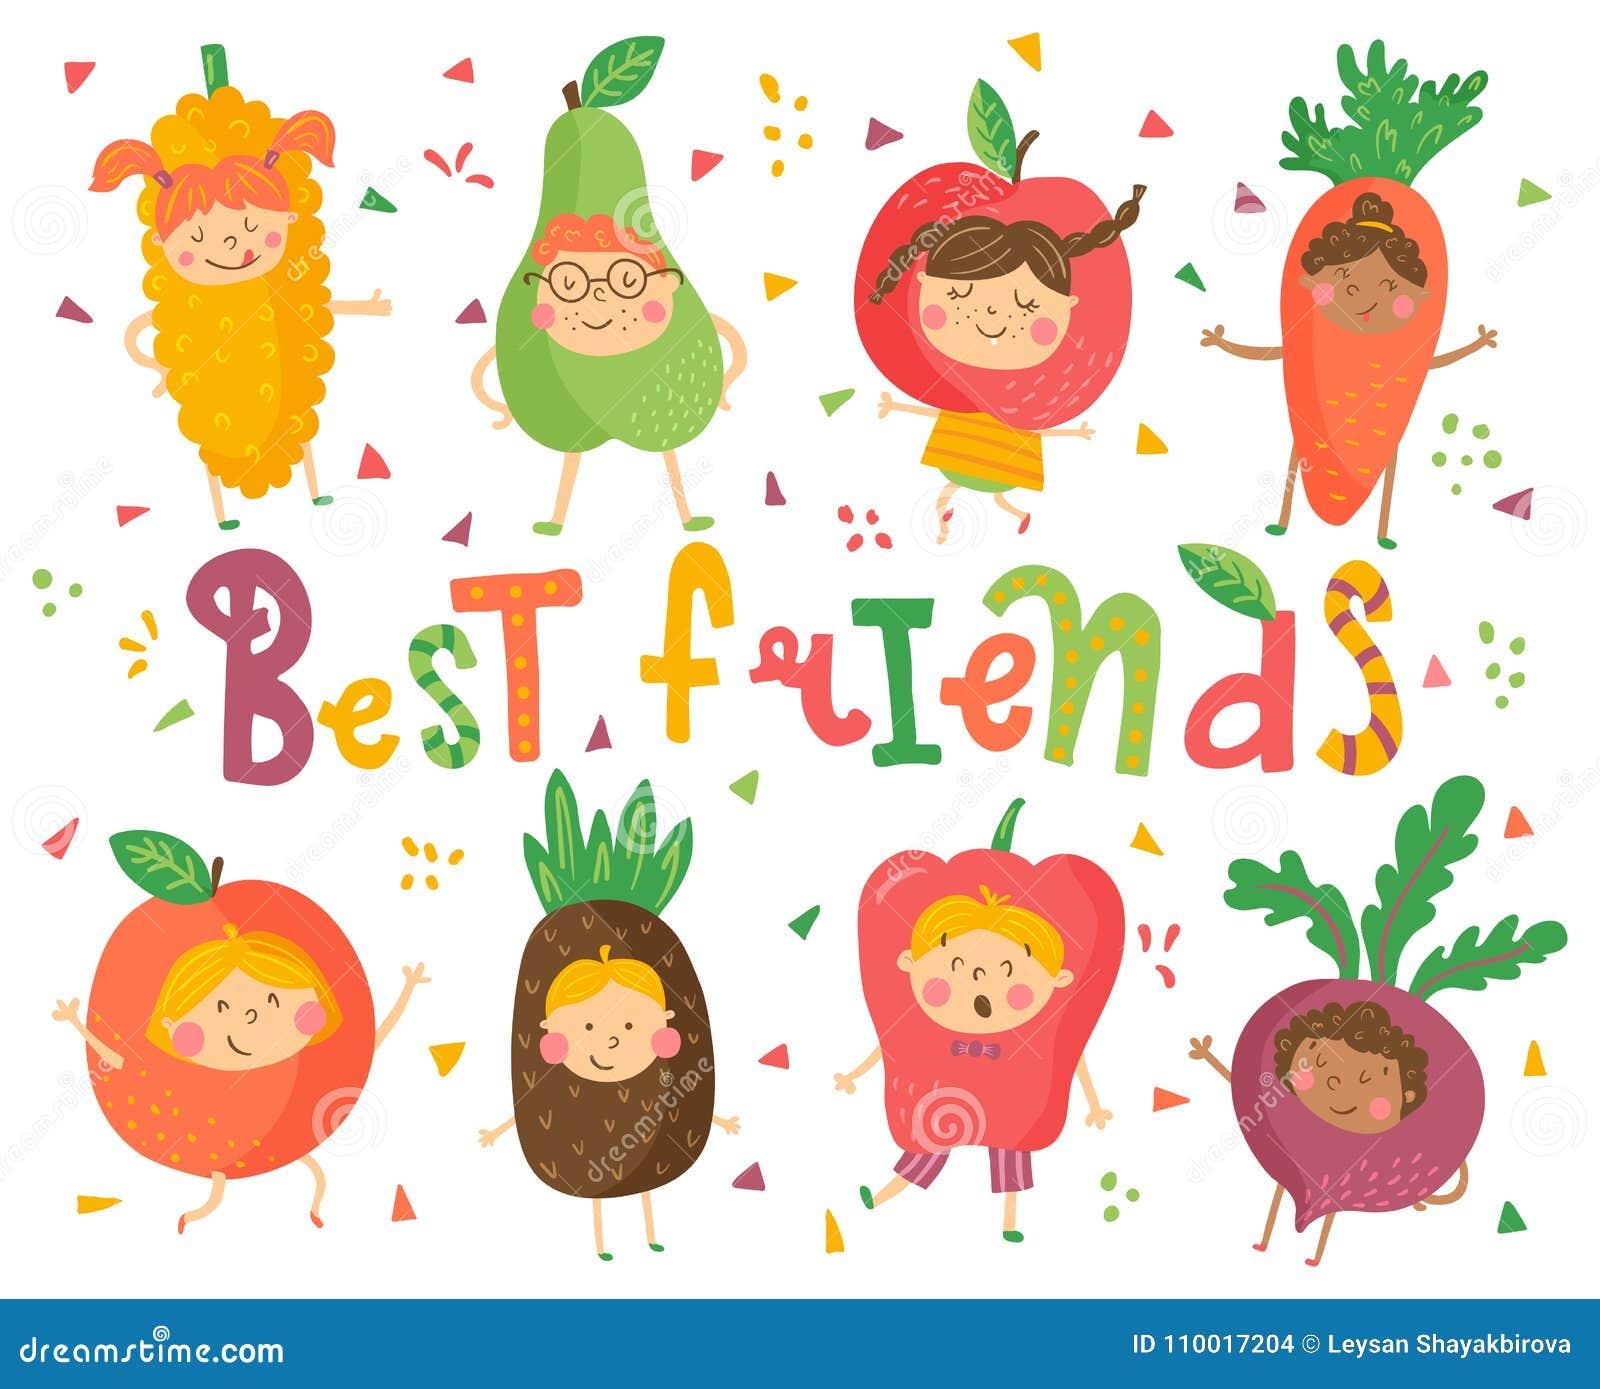 Download Best Fruit Friends Stock Vector Illustration Of Kids